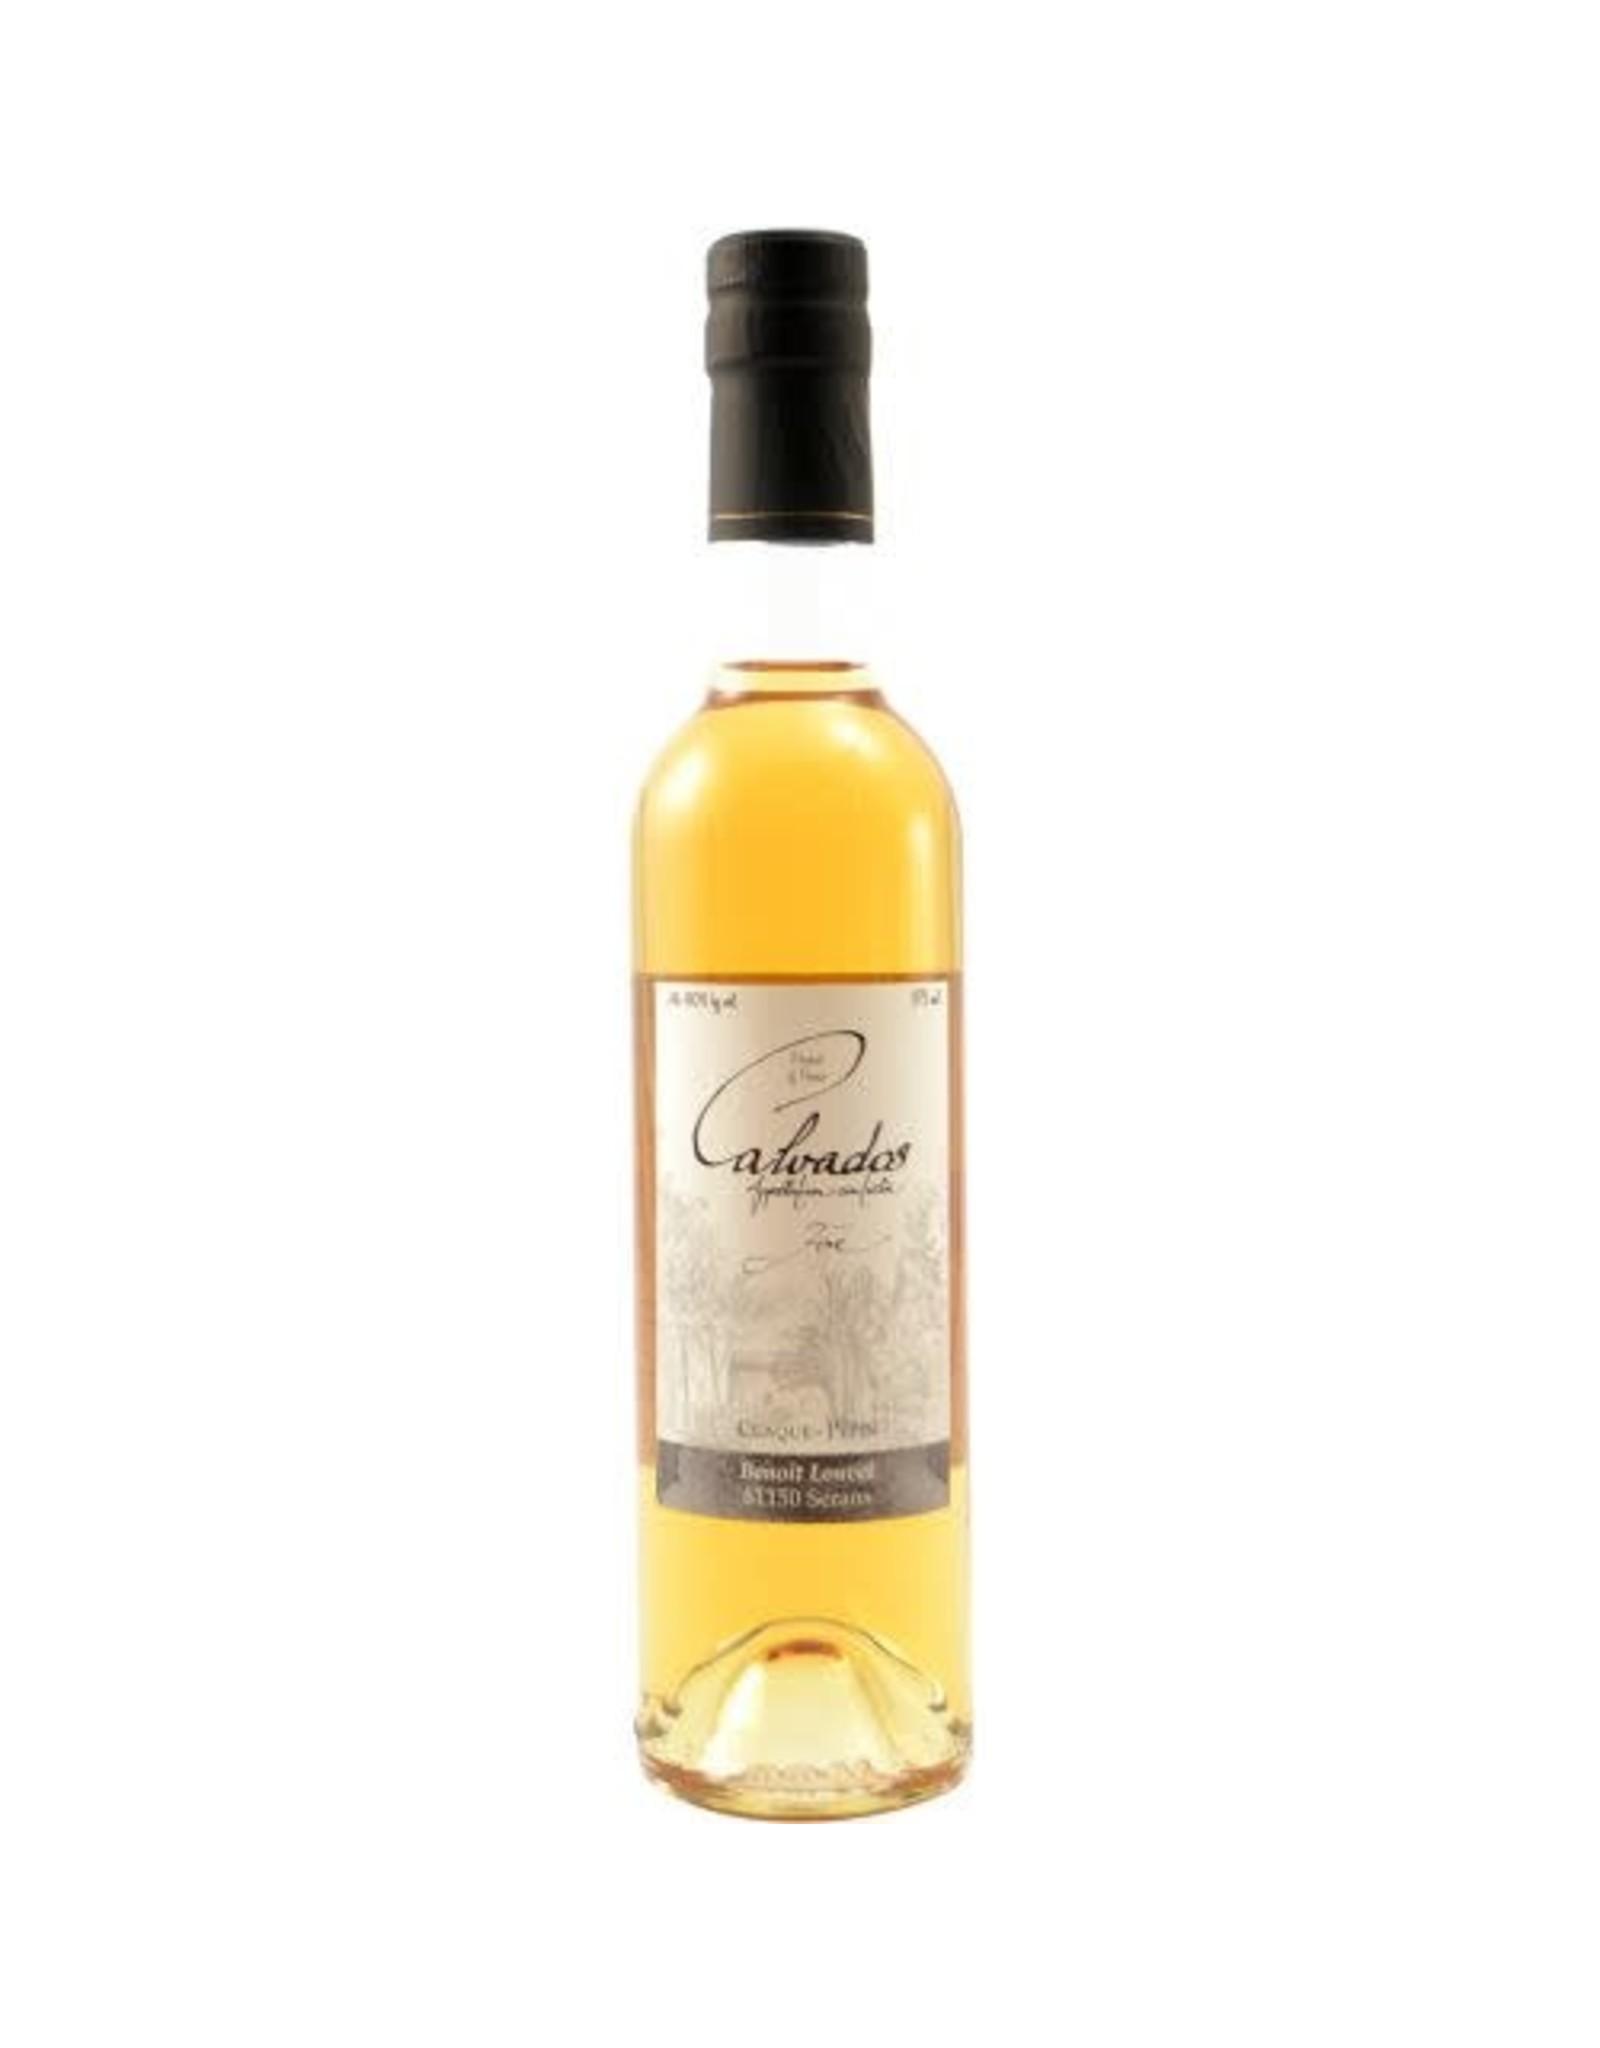 France Claque- Pepin Fine Calvados 375ml